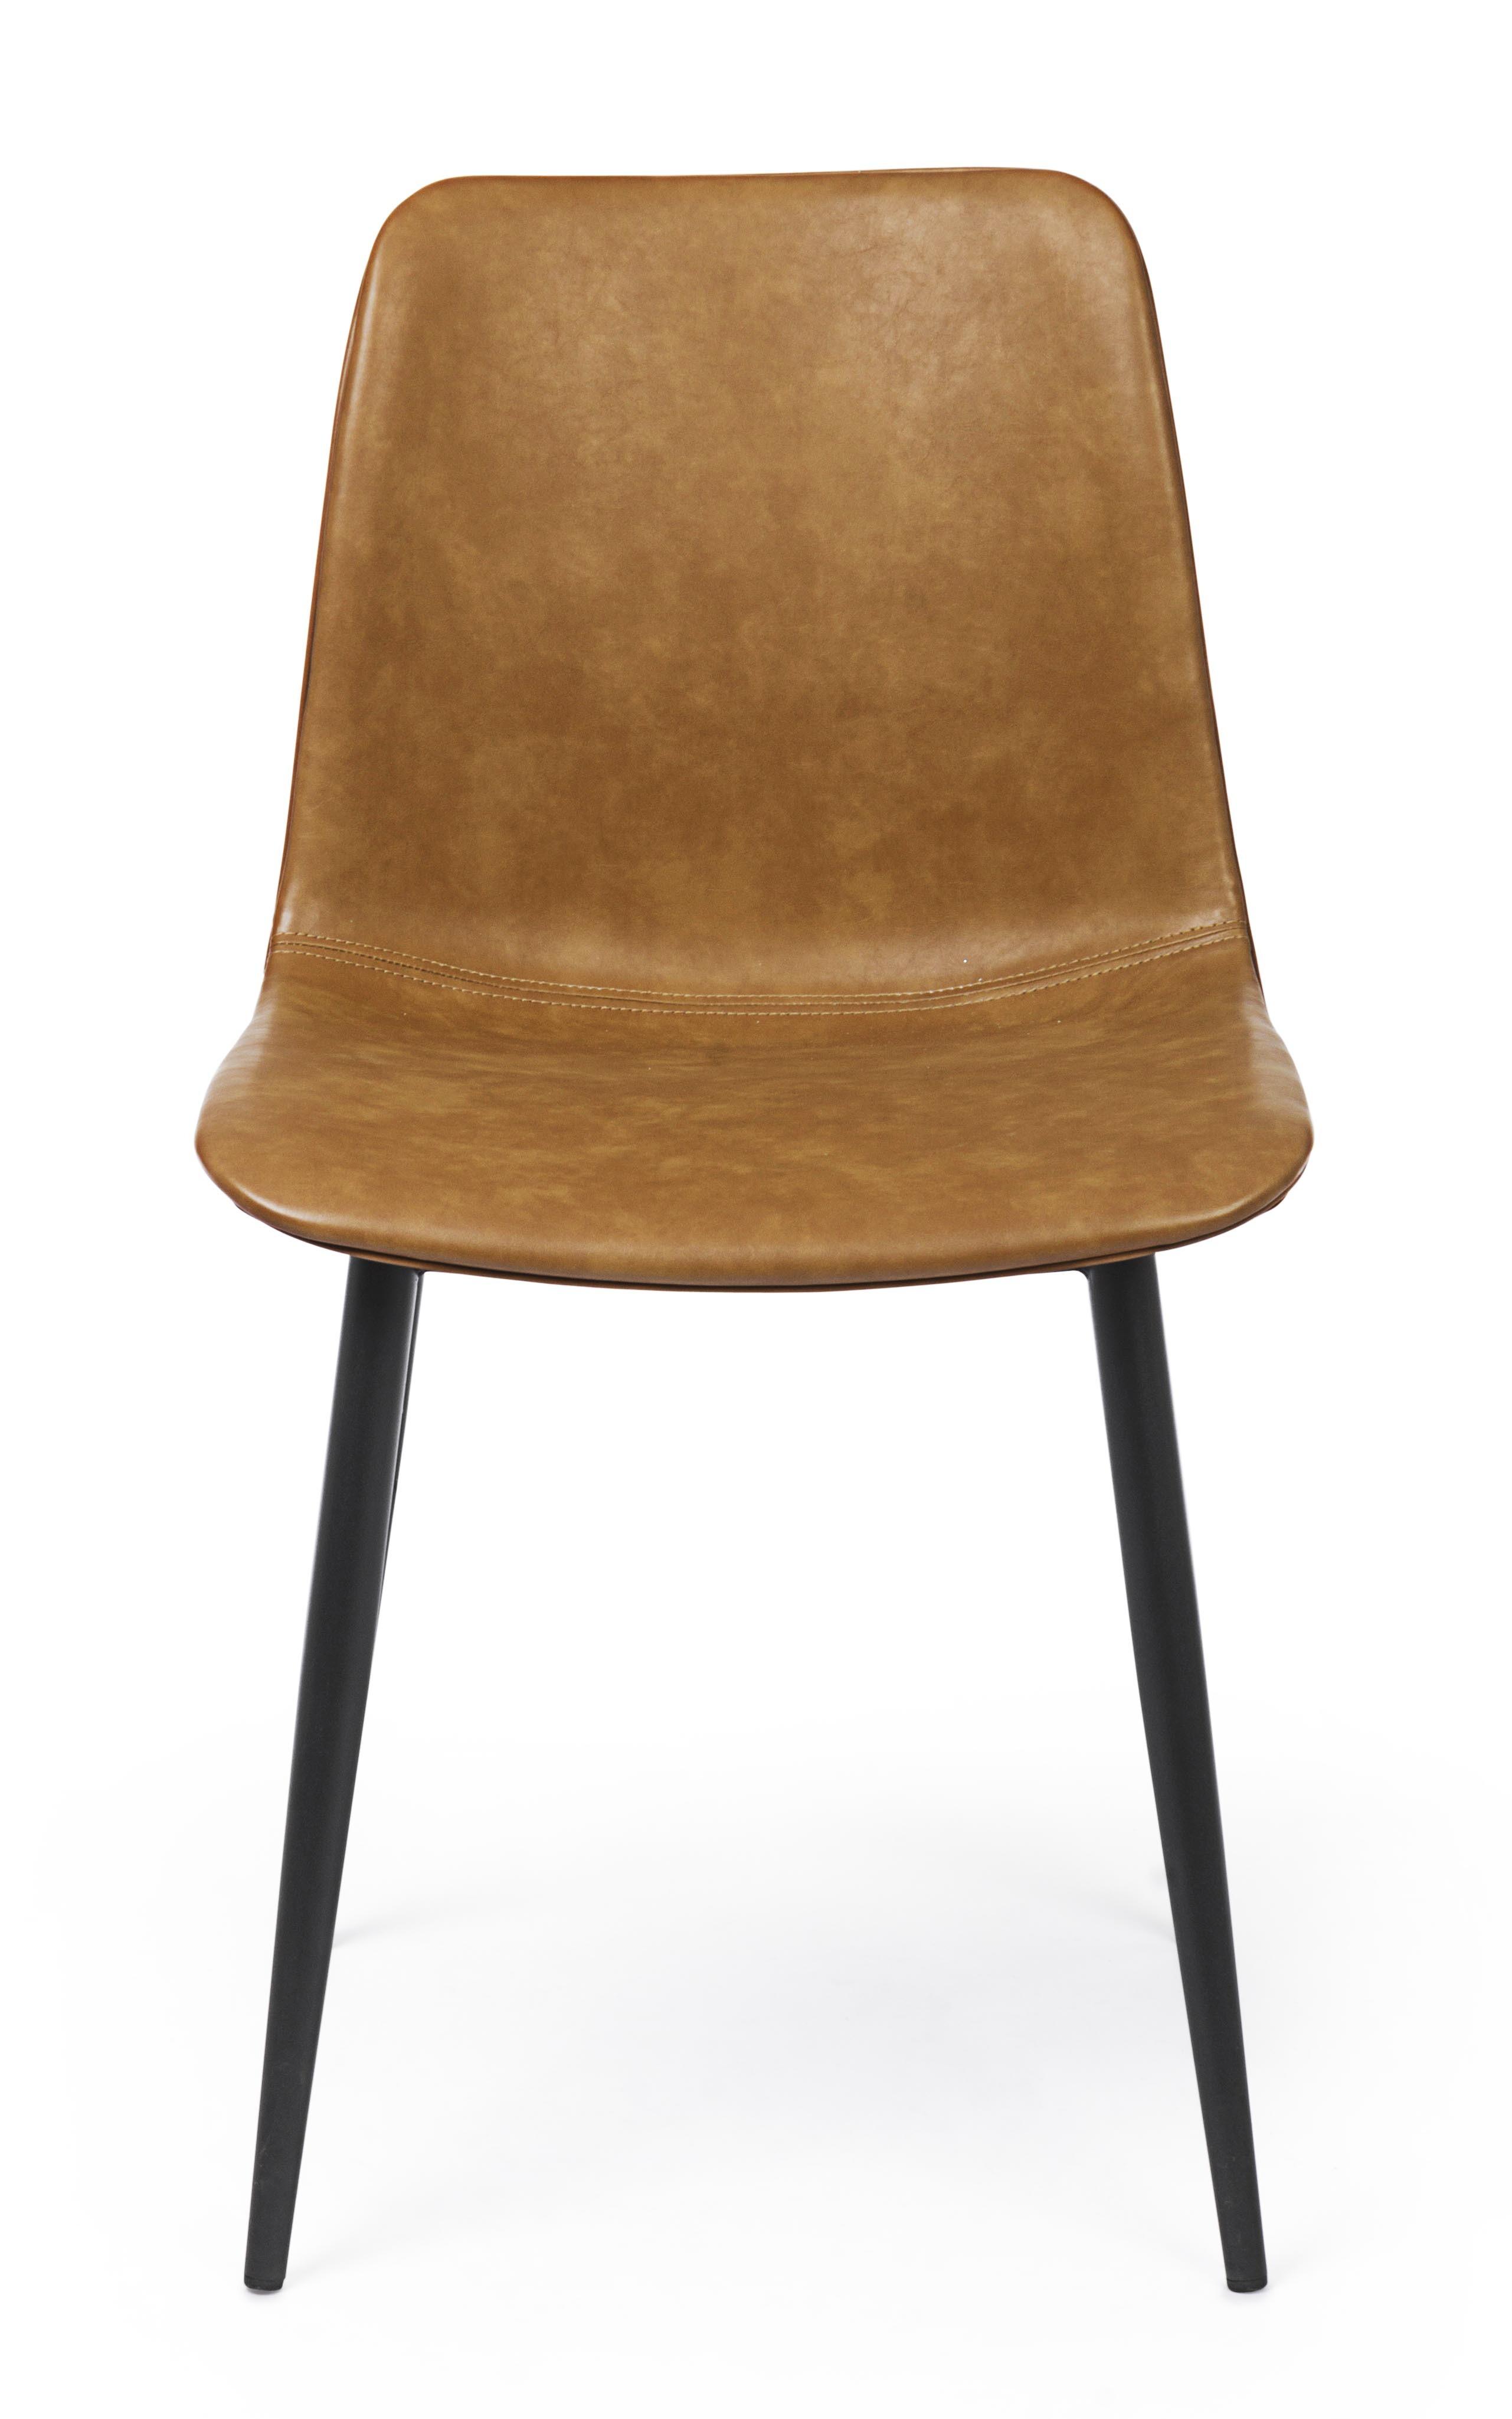 6 Stühle Kyra Pu  04